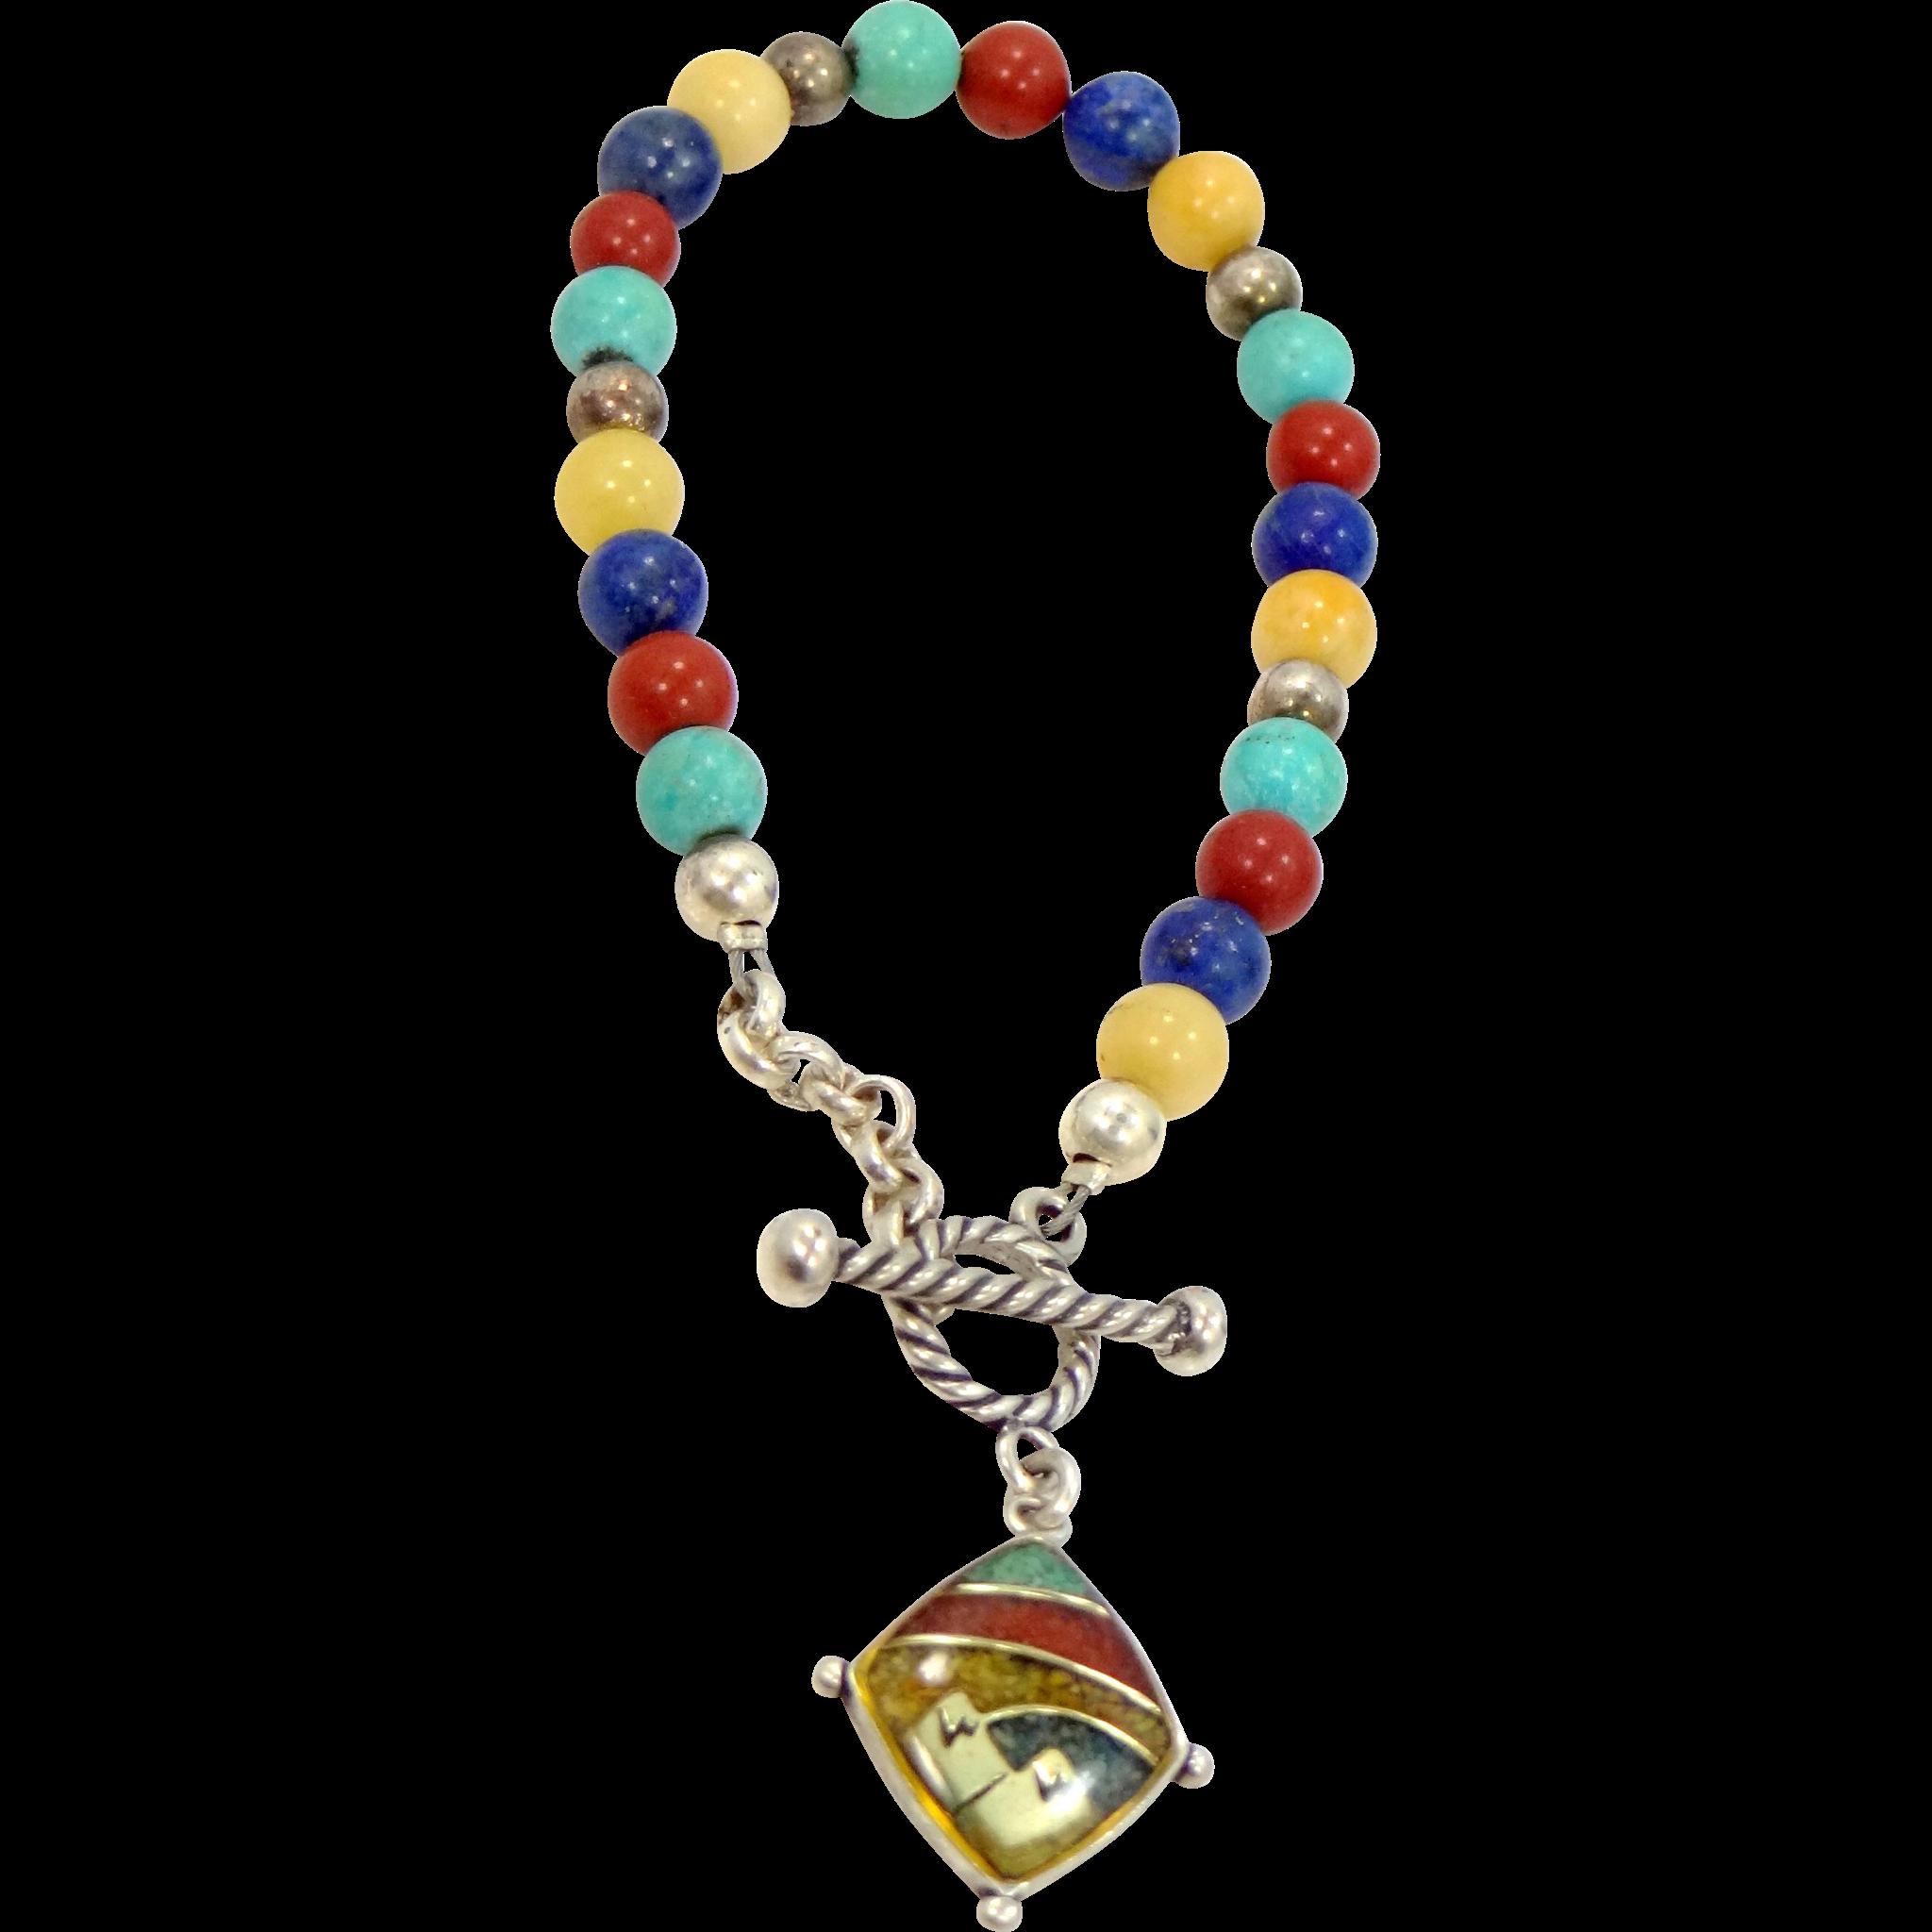 Relios Carolyn Pollack Sterling Silver & Inlaid Gemstones Bracelet